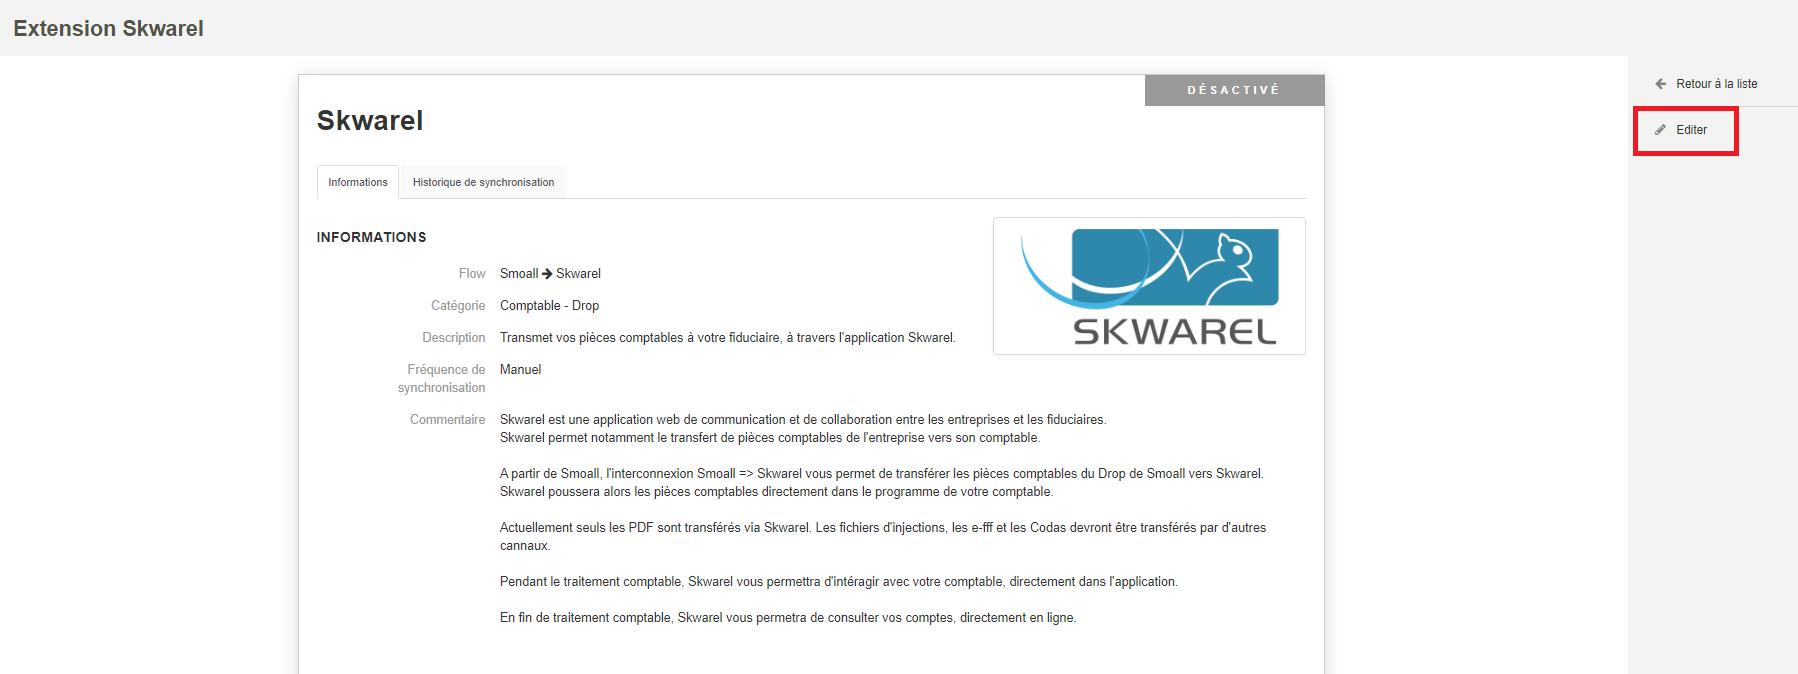 Smoall-Extensions-Editer extension Skwarel